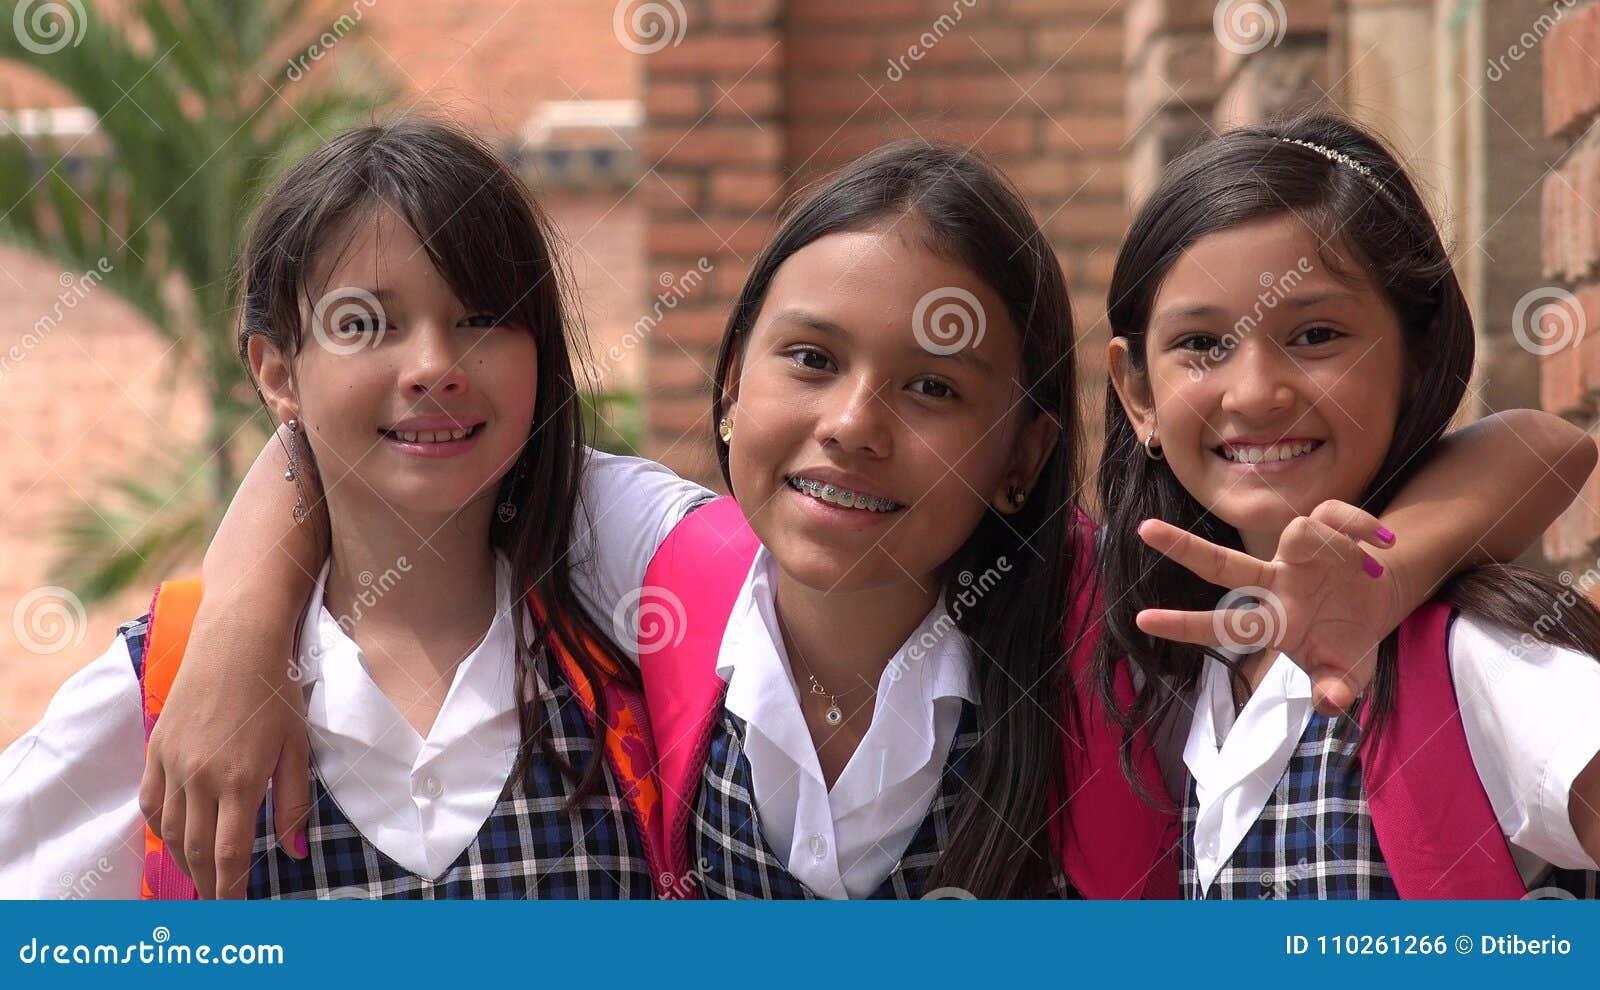 White Girl School Uniform